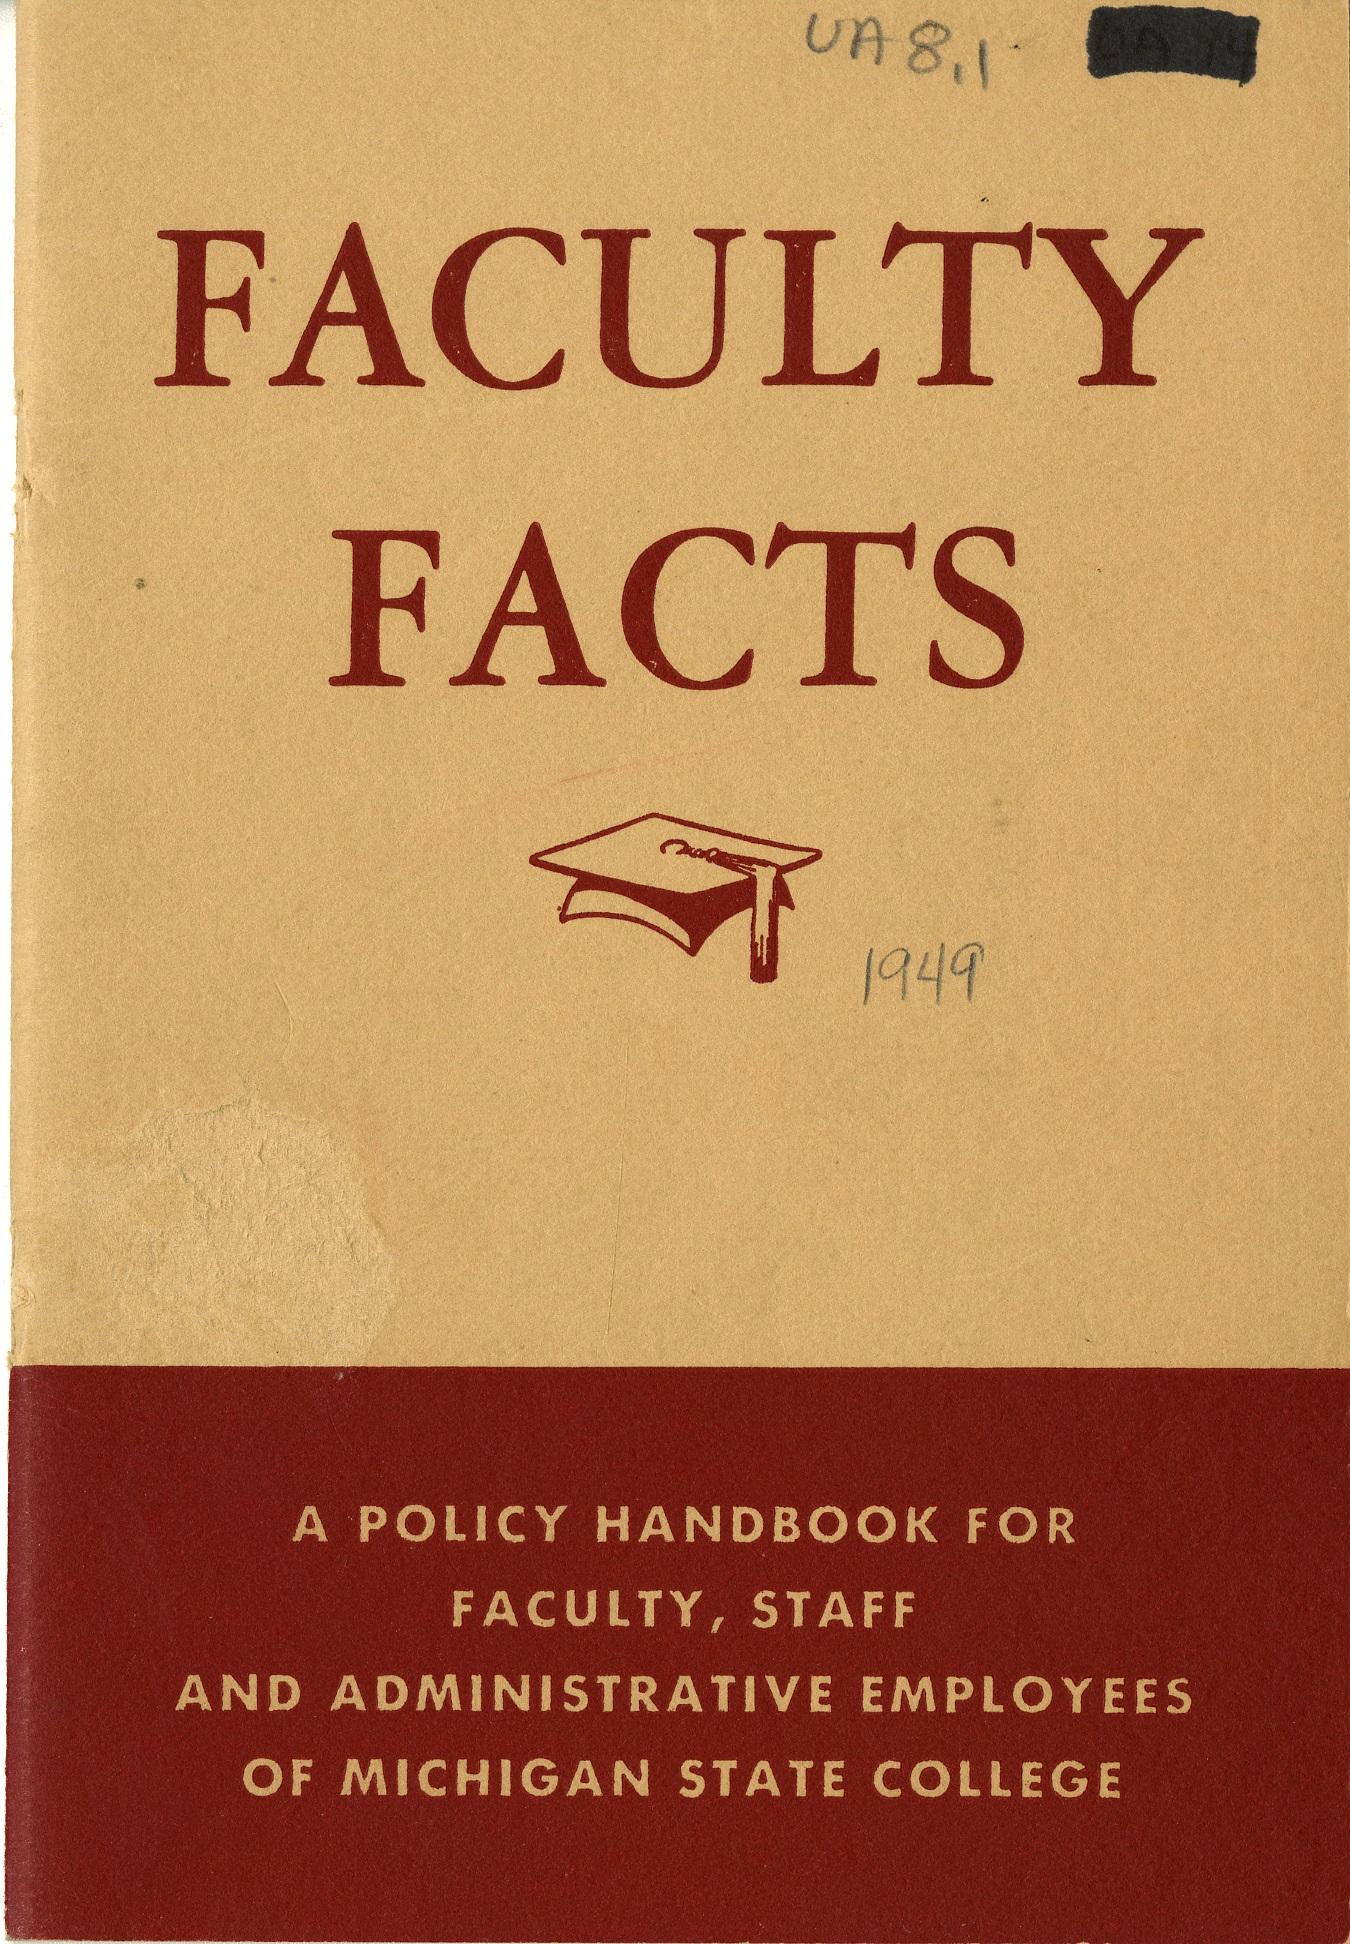 Faculty Handbook, 1949